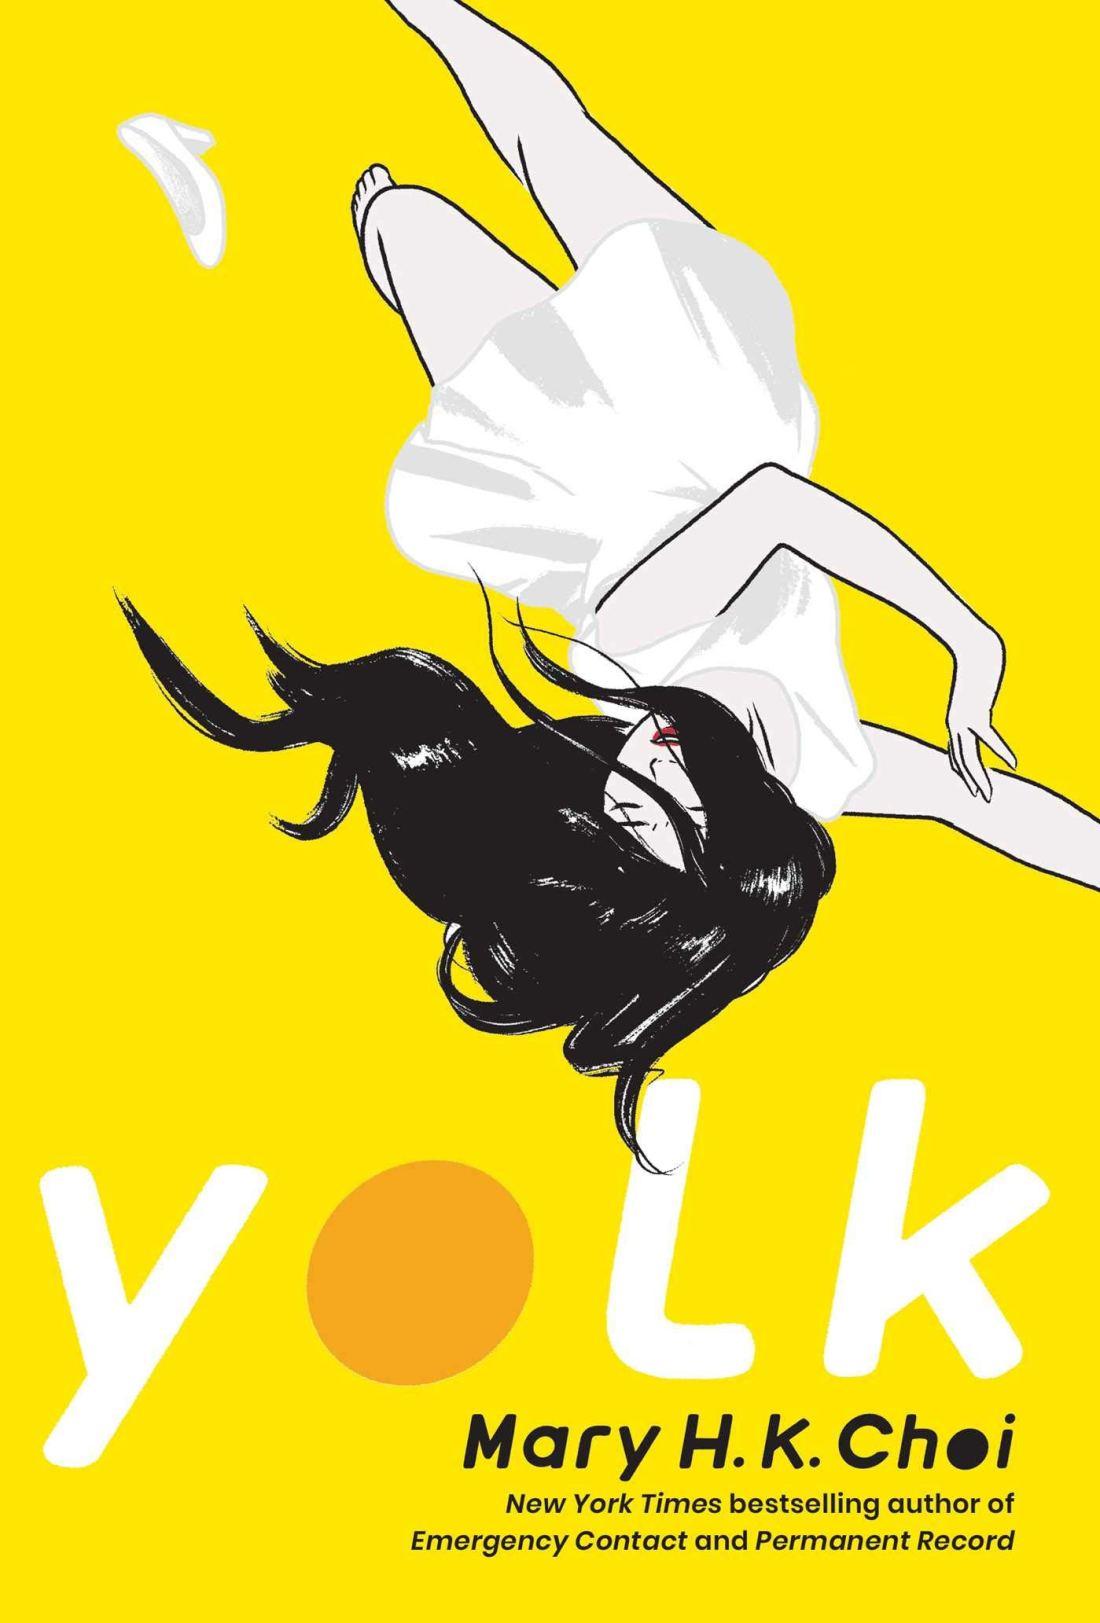 Amazon.com: Yolk (9781534446007): Choi, Mary H. K.: Books